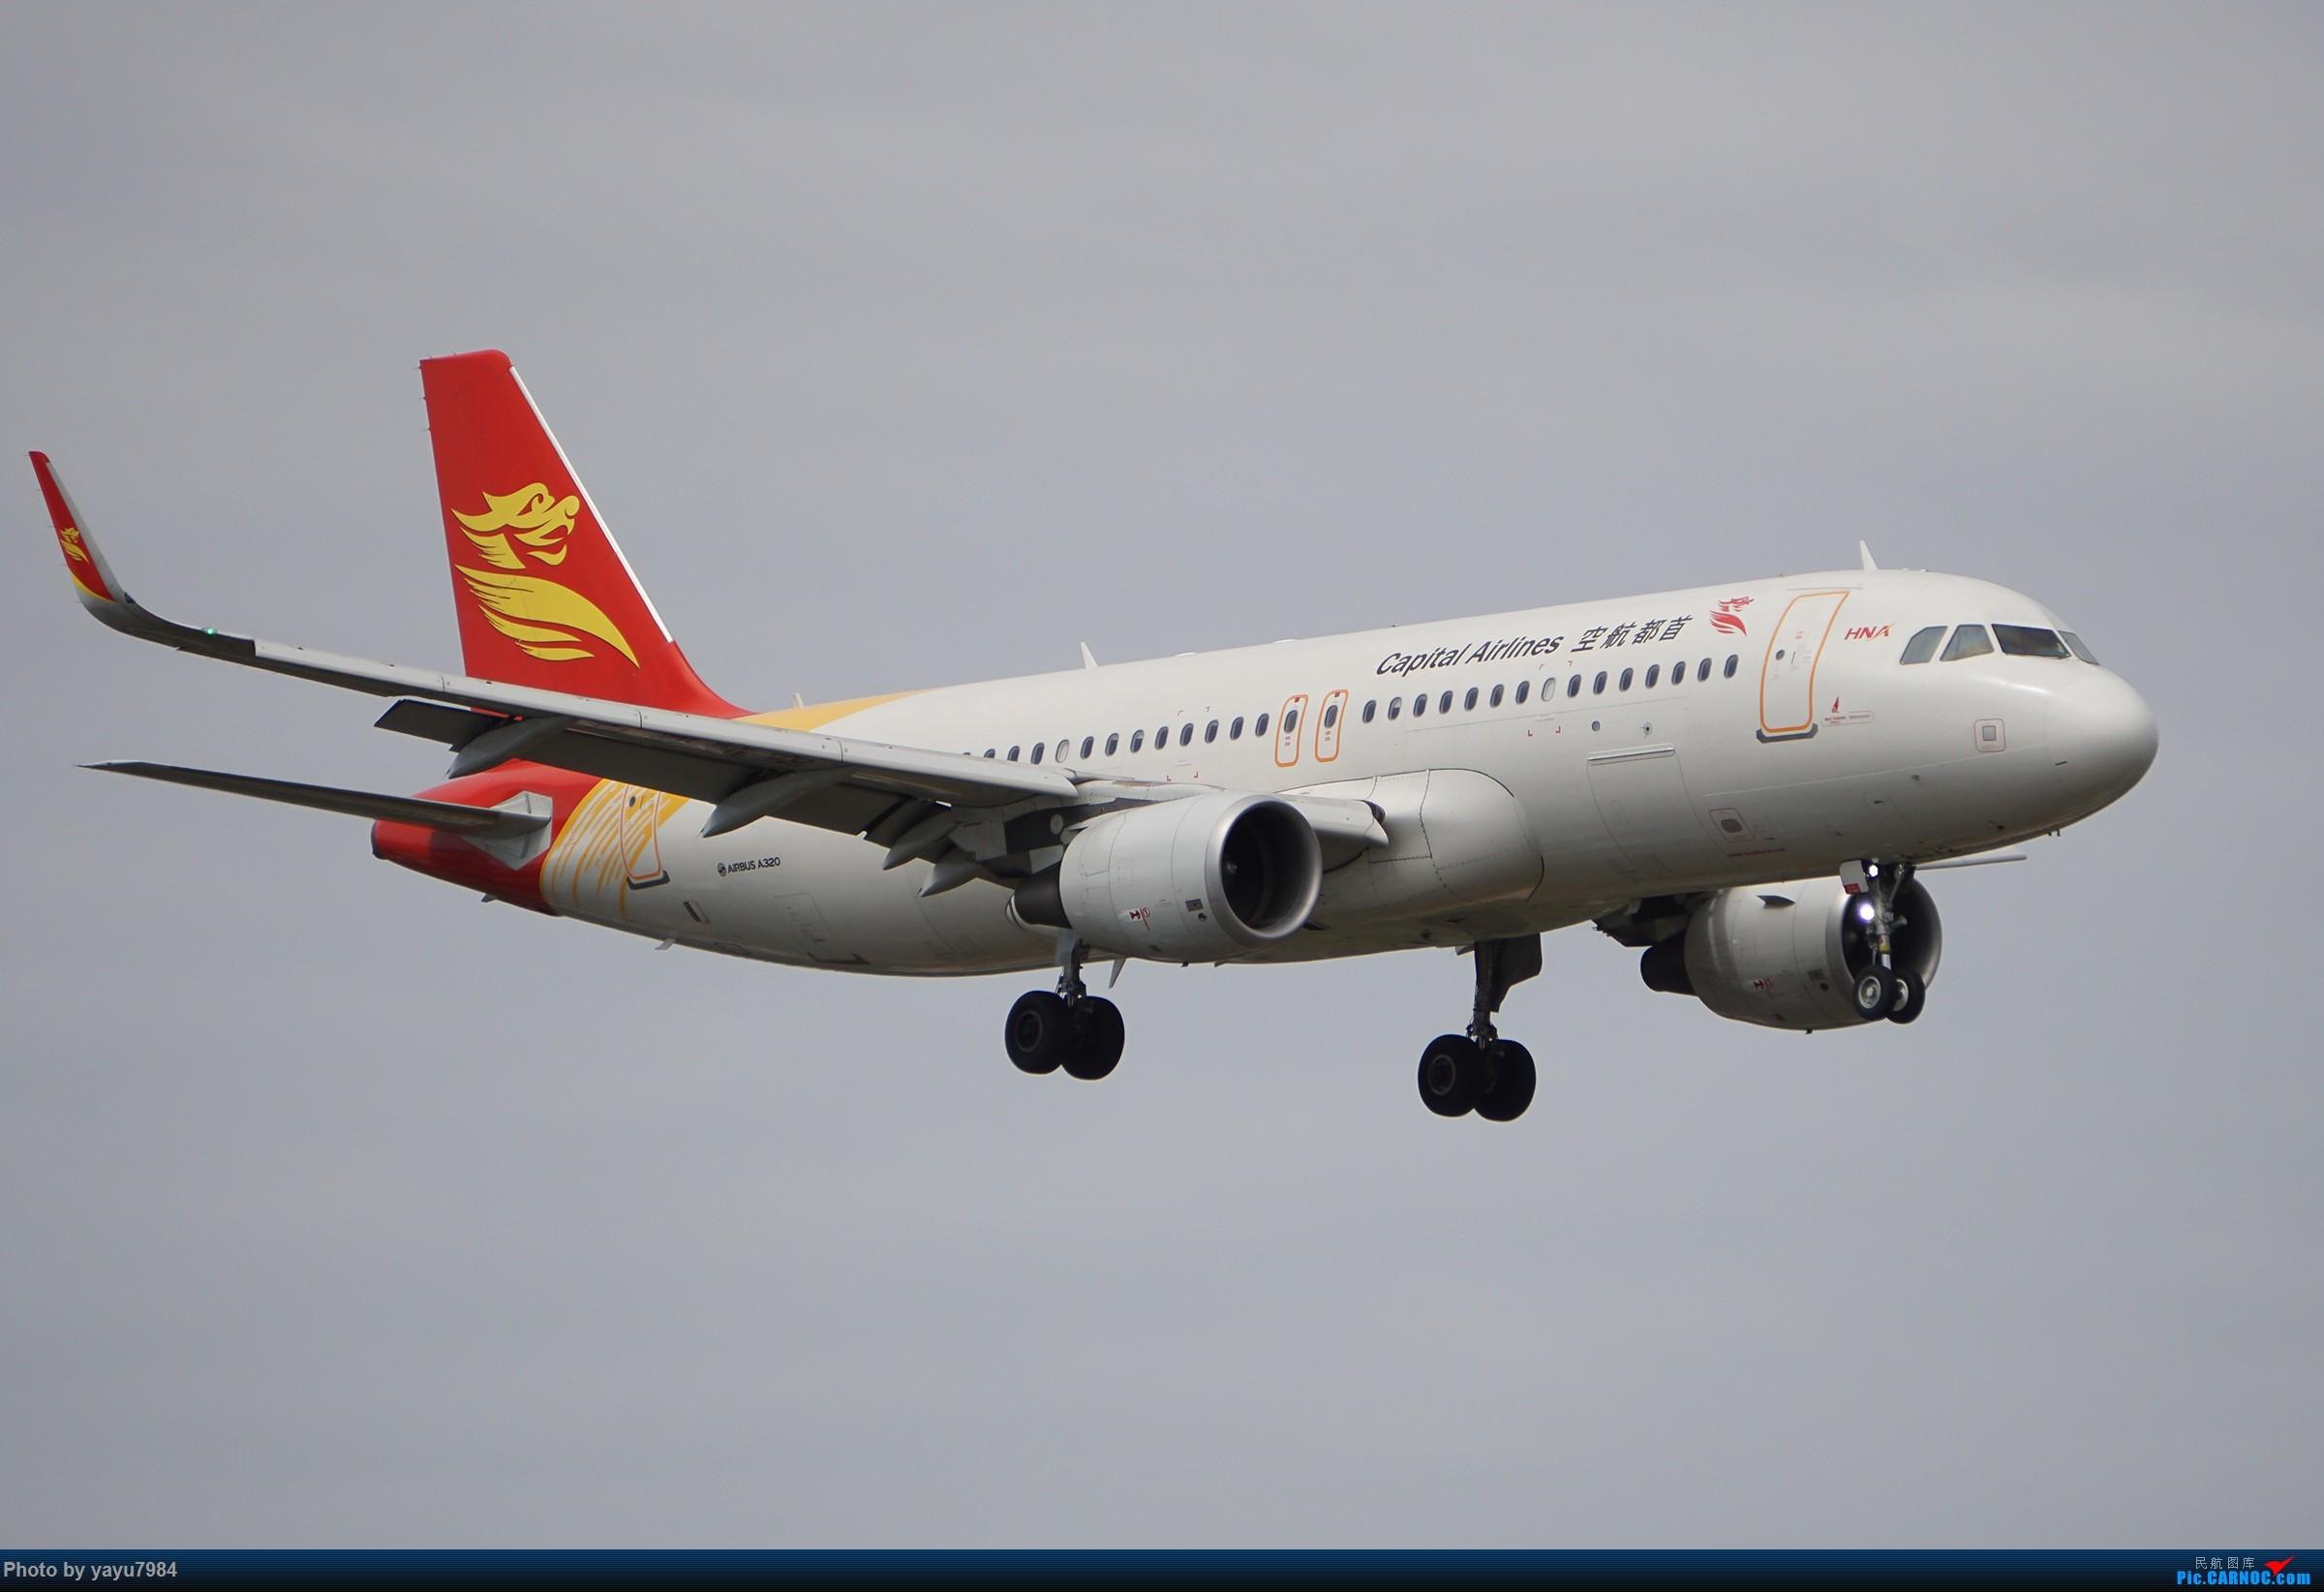 Re:[原创][SYX] 回国首拍,春运高峰时段的三亚凤凰国际机场 AIRBUS A320-200 B-8072 中国三亚凤凰国际机场